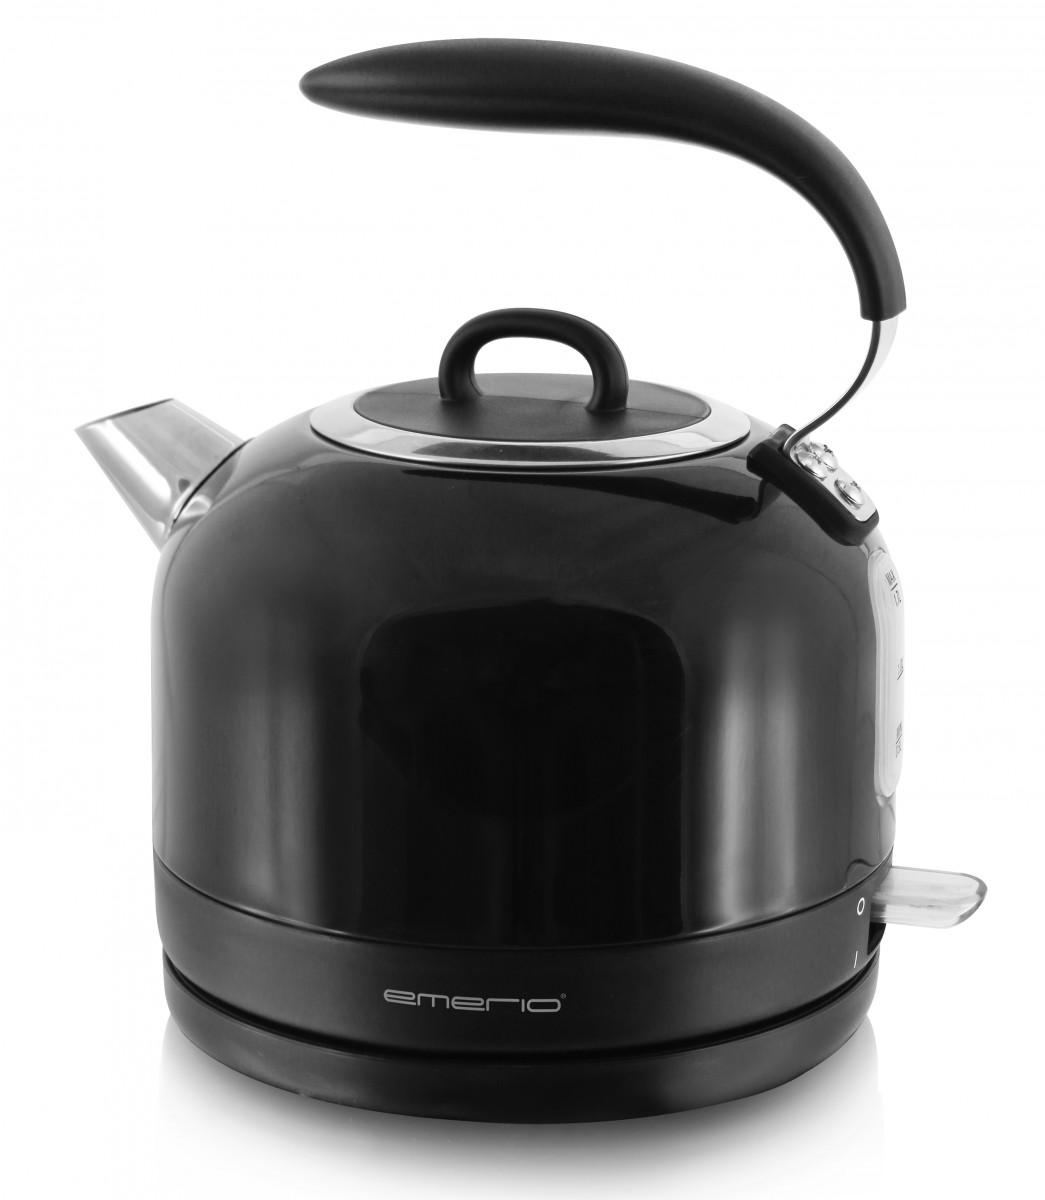 Wasserkocher schwarz 2200 Watt Emerio WK-111081 – Bild 1